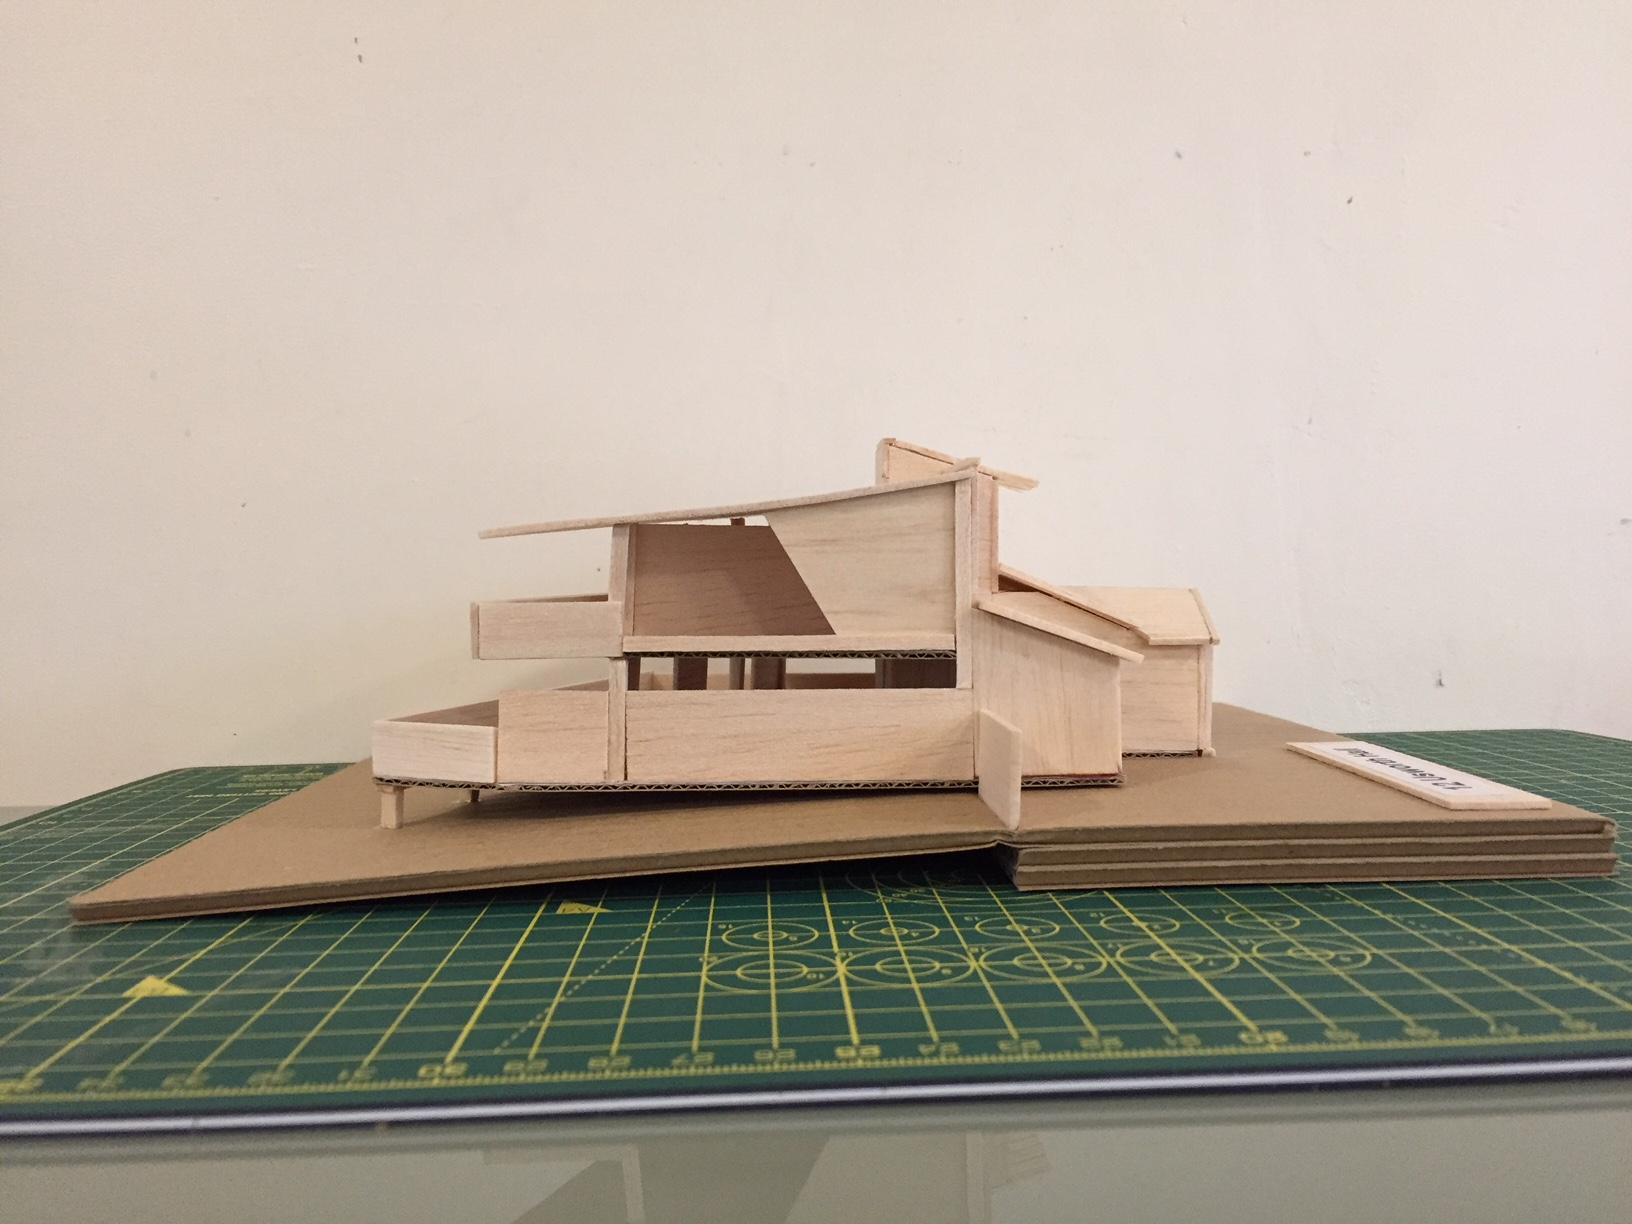 Usworth hall1